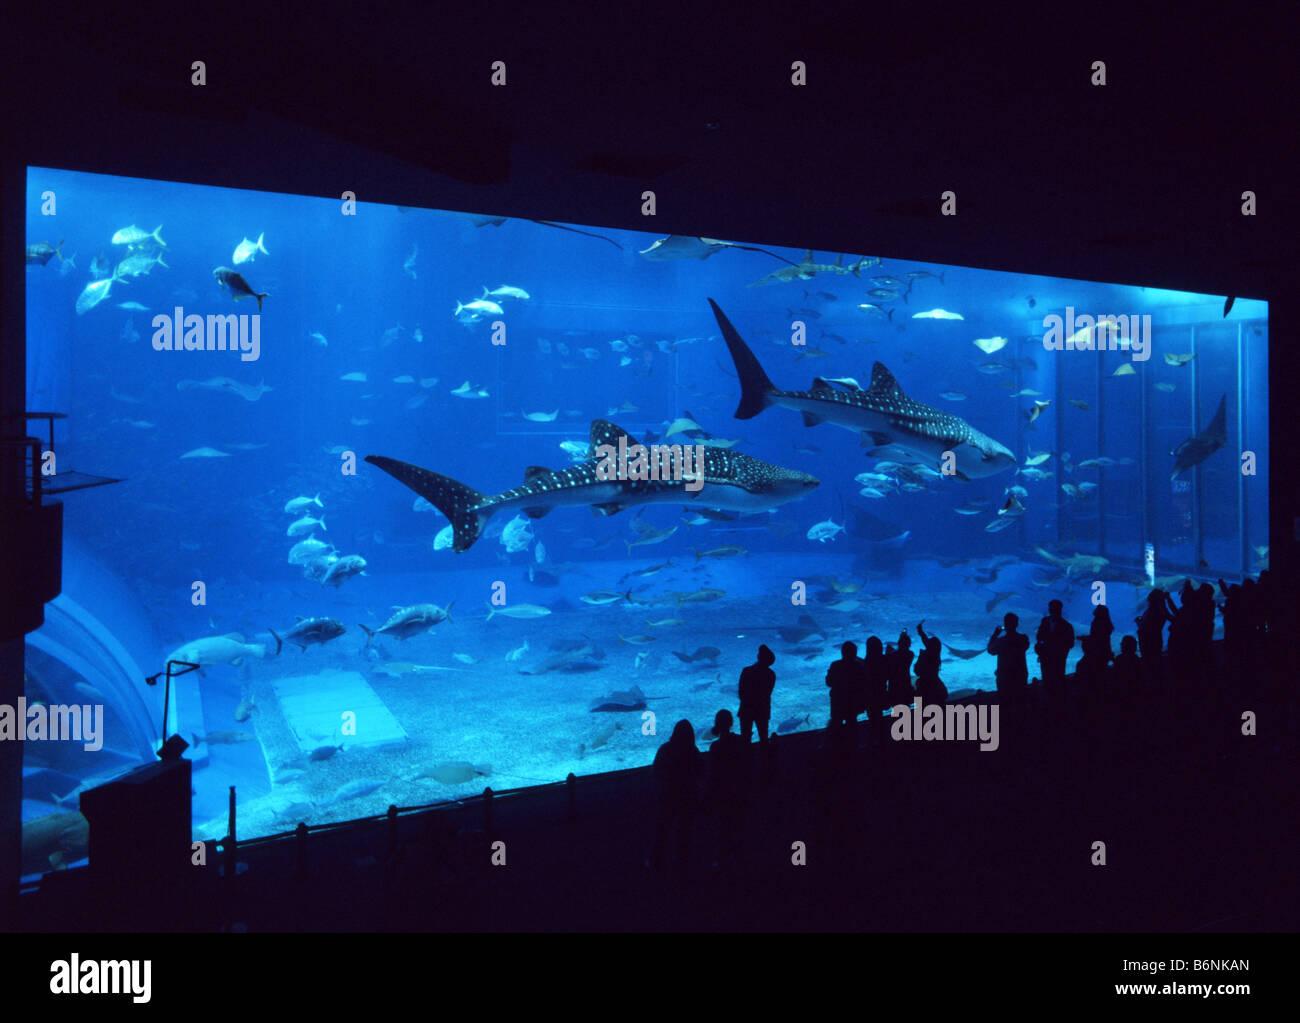 Main Tank Window The Largest Aquarium Window In The World At Stock